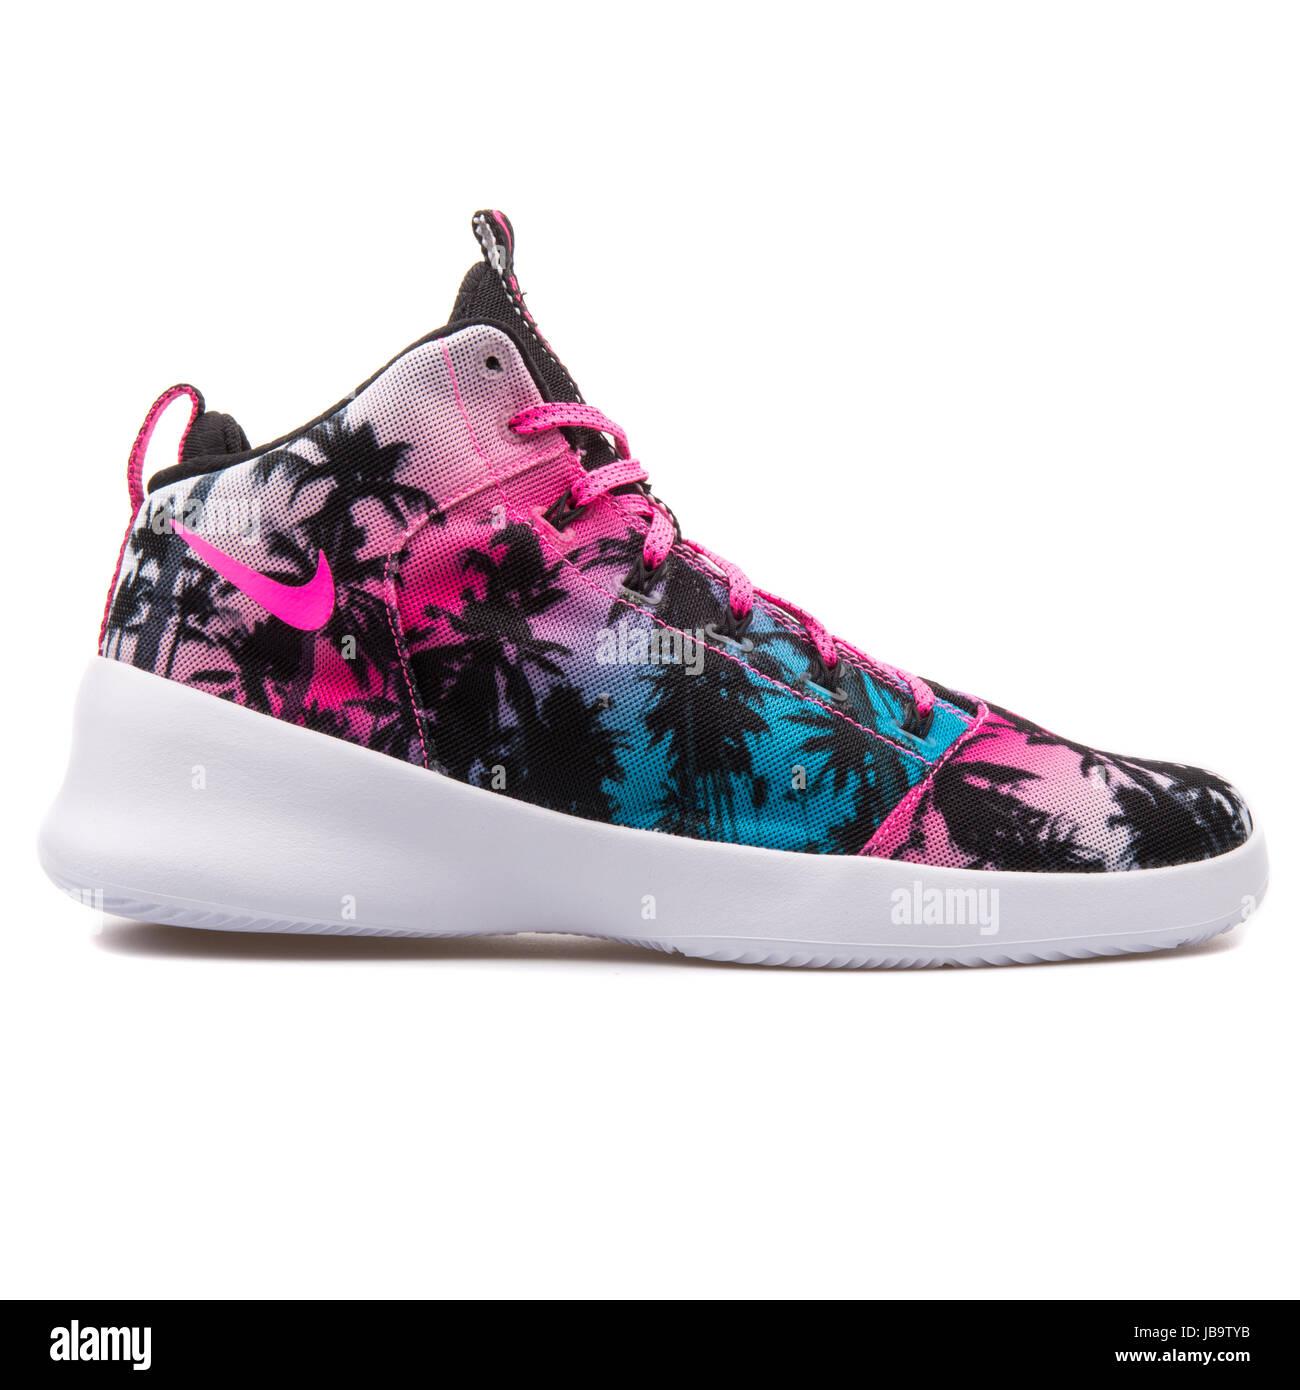 newest 7c6cd 3db8b Nike Hyperfr3sh QS Blue Lagoon, Pink Blast Men s Basketball Shoes - 808781- 400